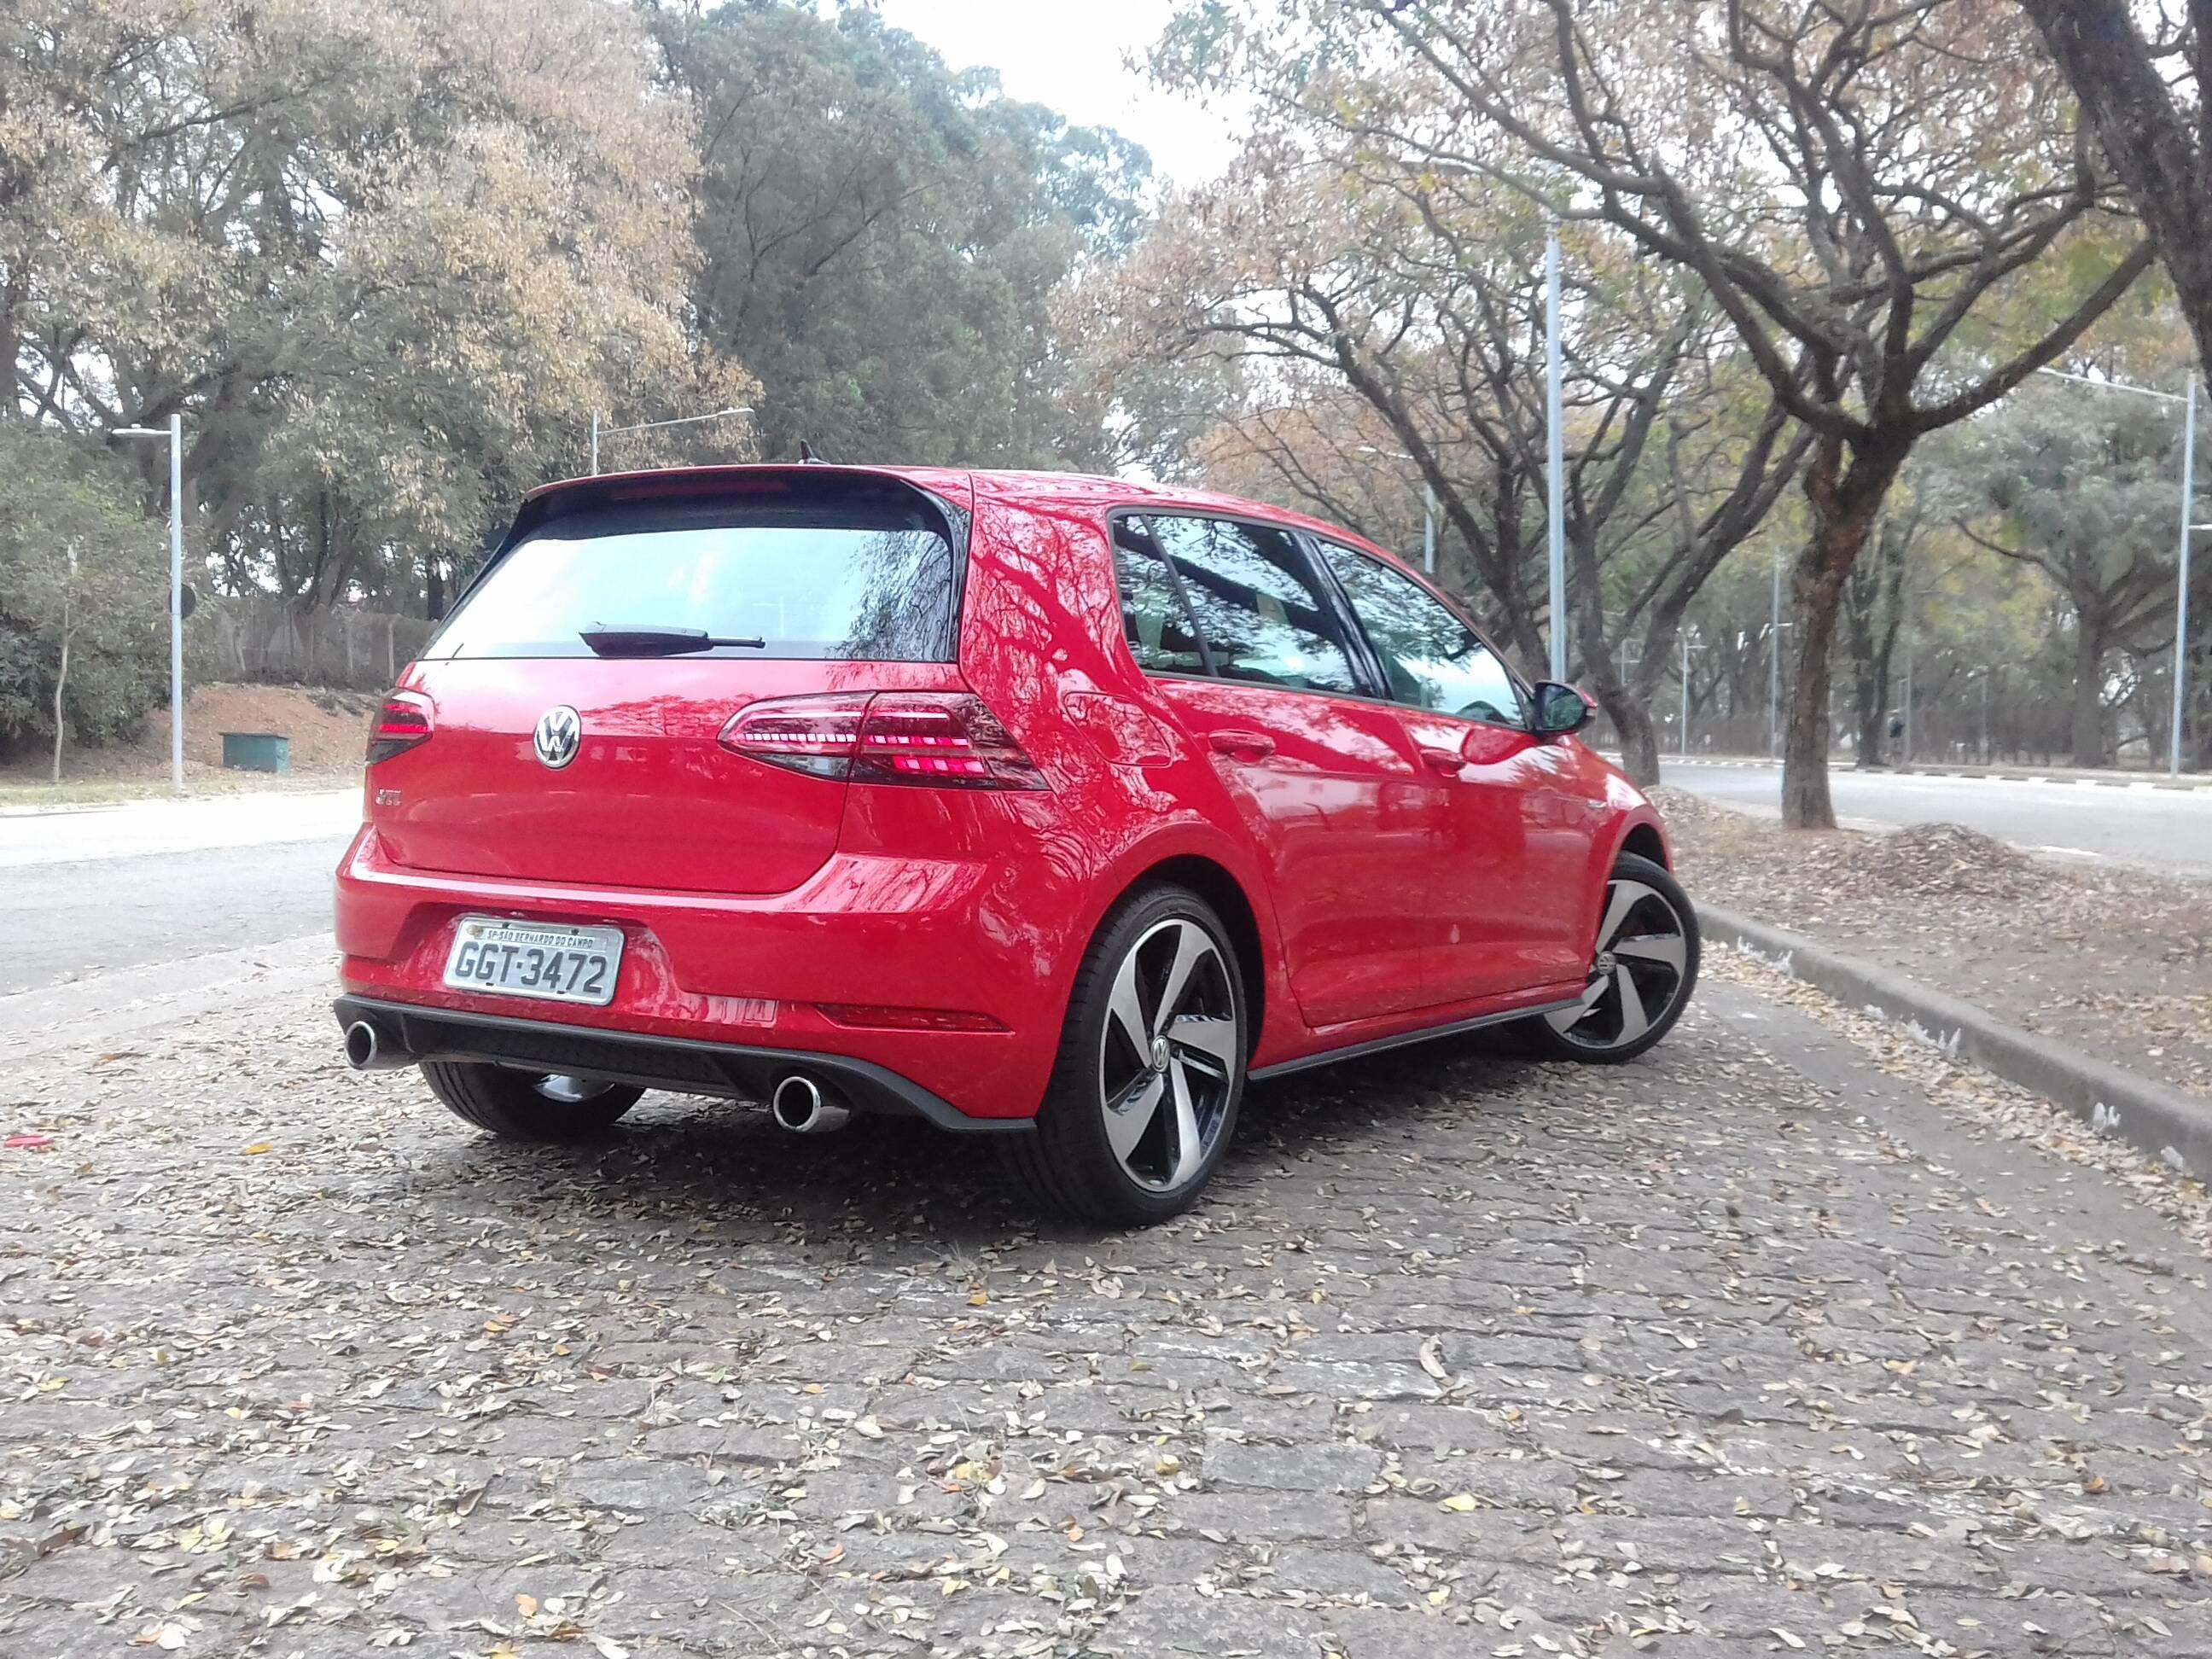 VW Golf GTI. Foto: Carlos Guimarães/iG